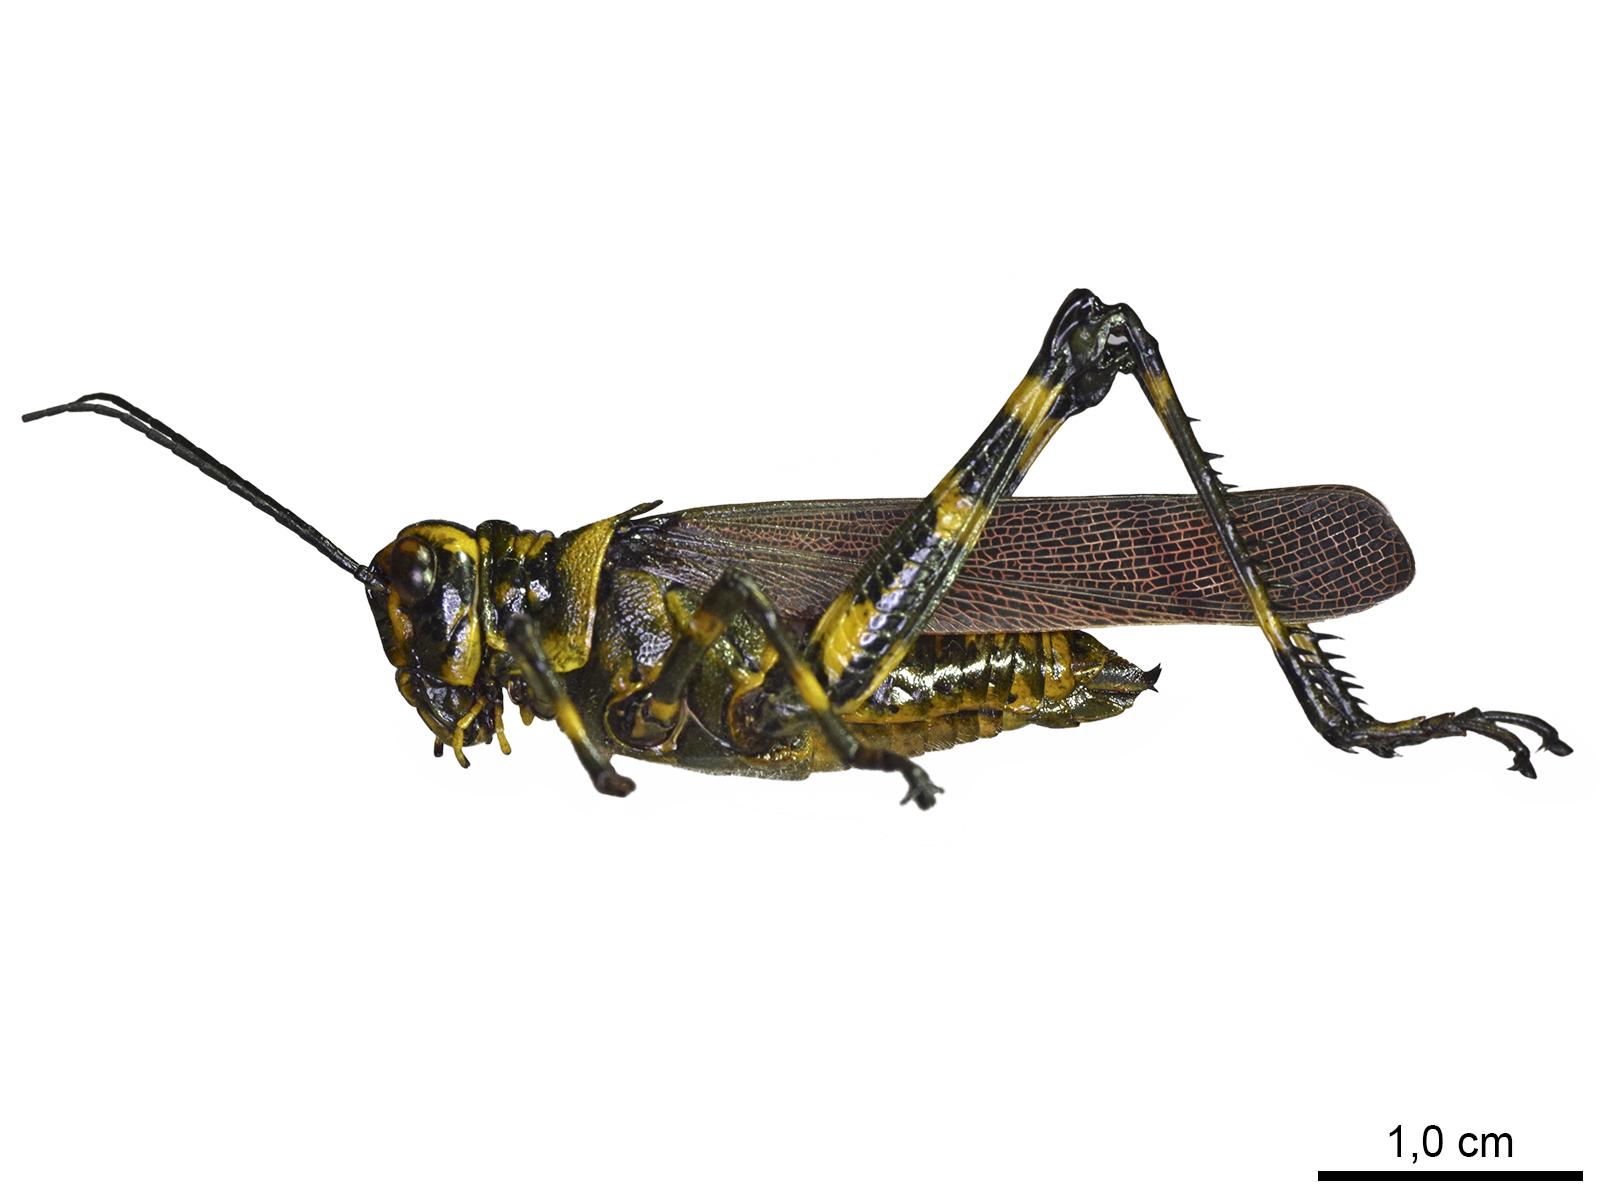 Chromacrisspeciosa(Thunberg, 1824)